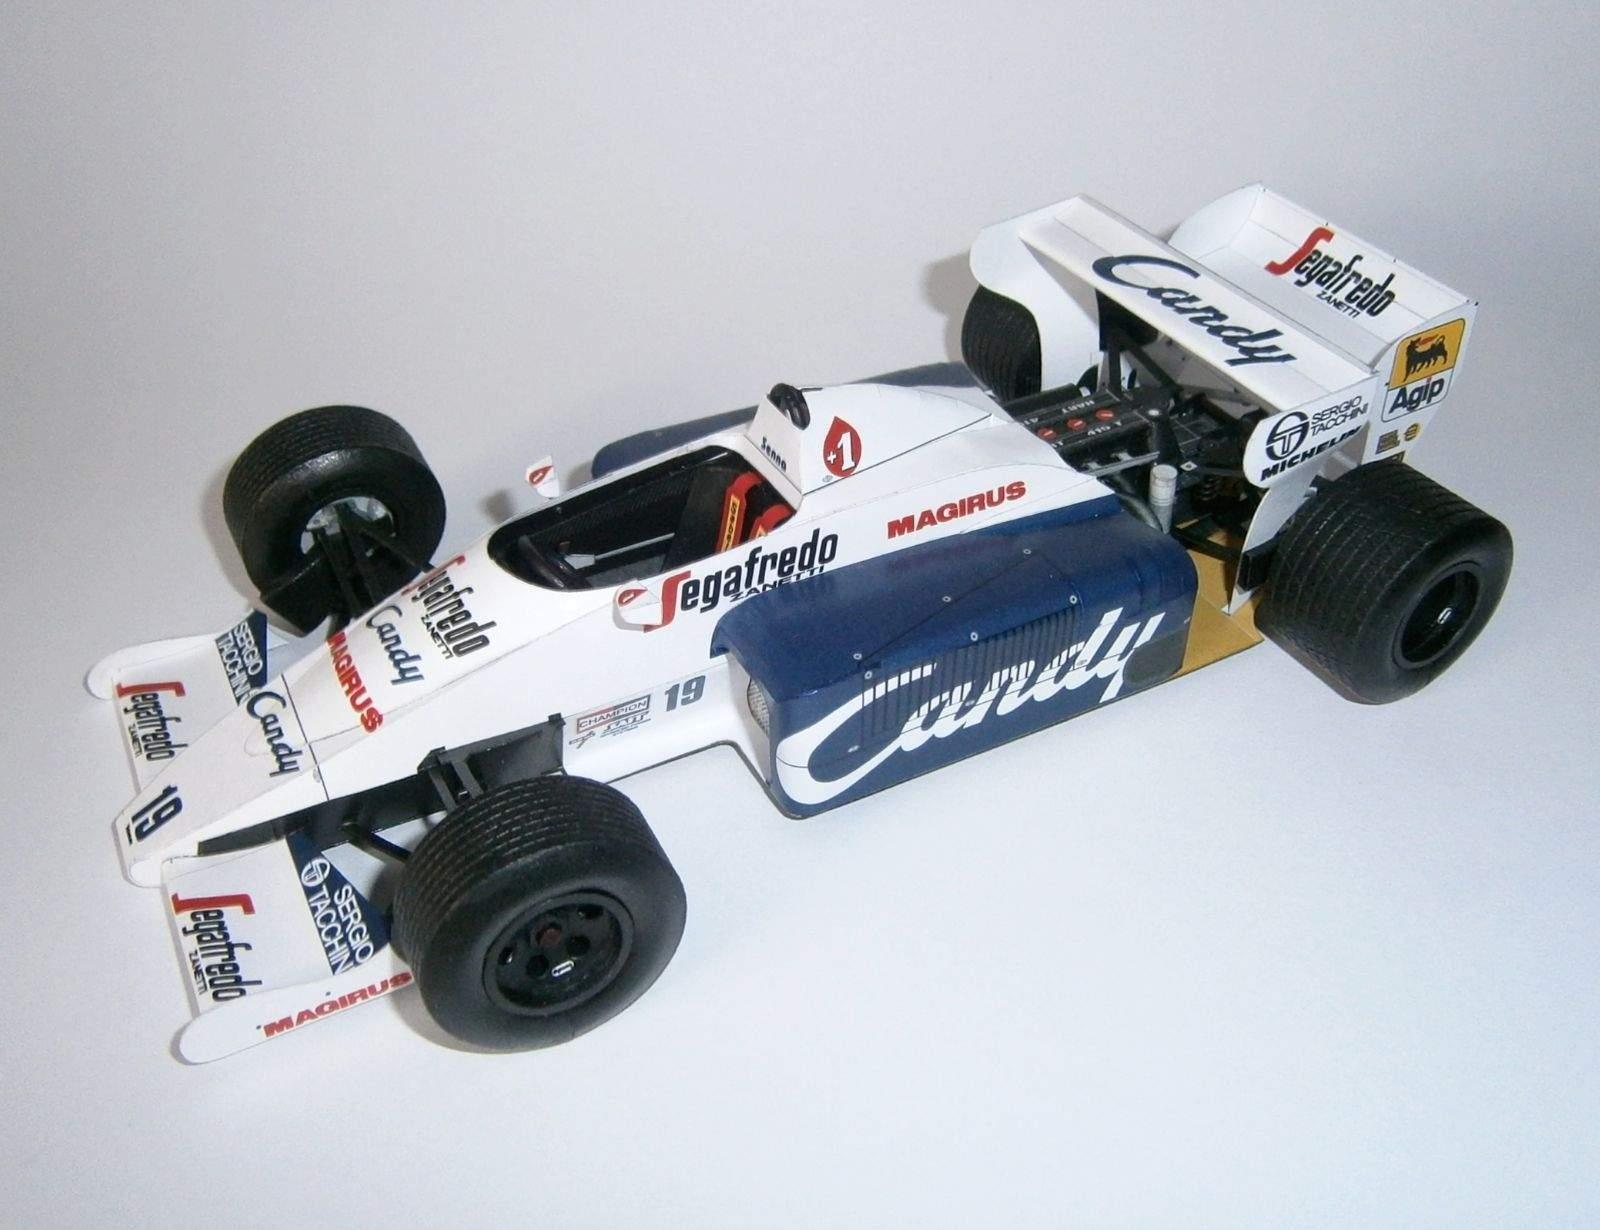 Toleman TG184 - A.Senna, GP Monaco 1984